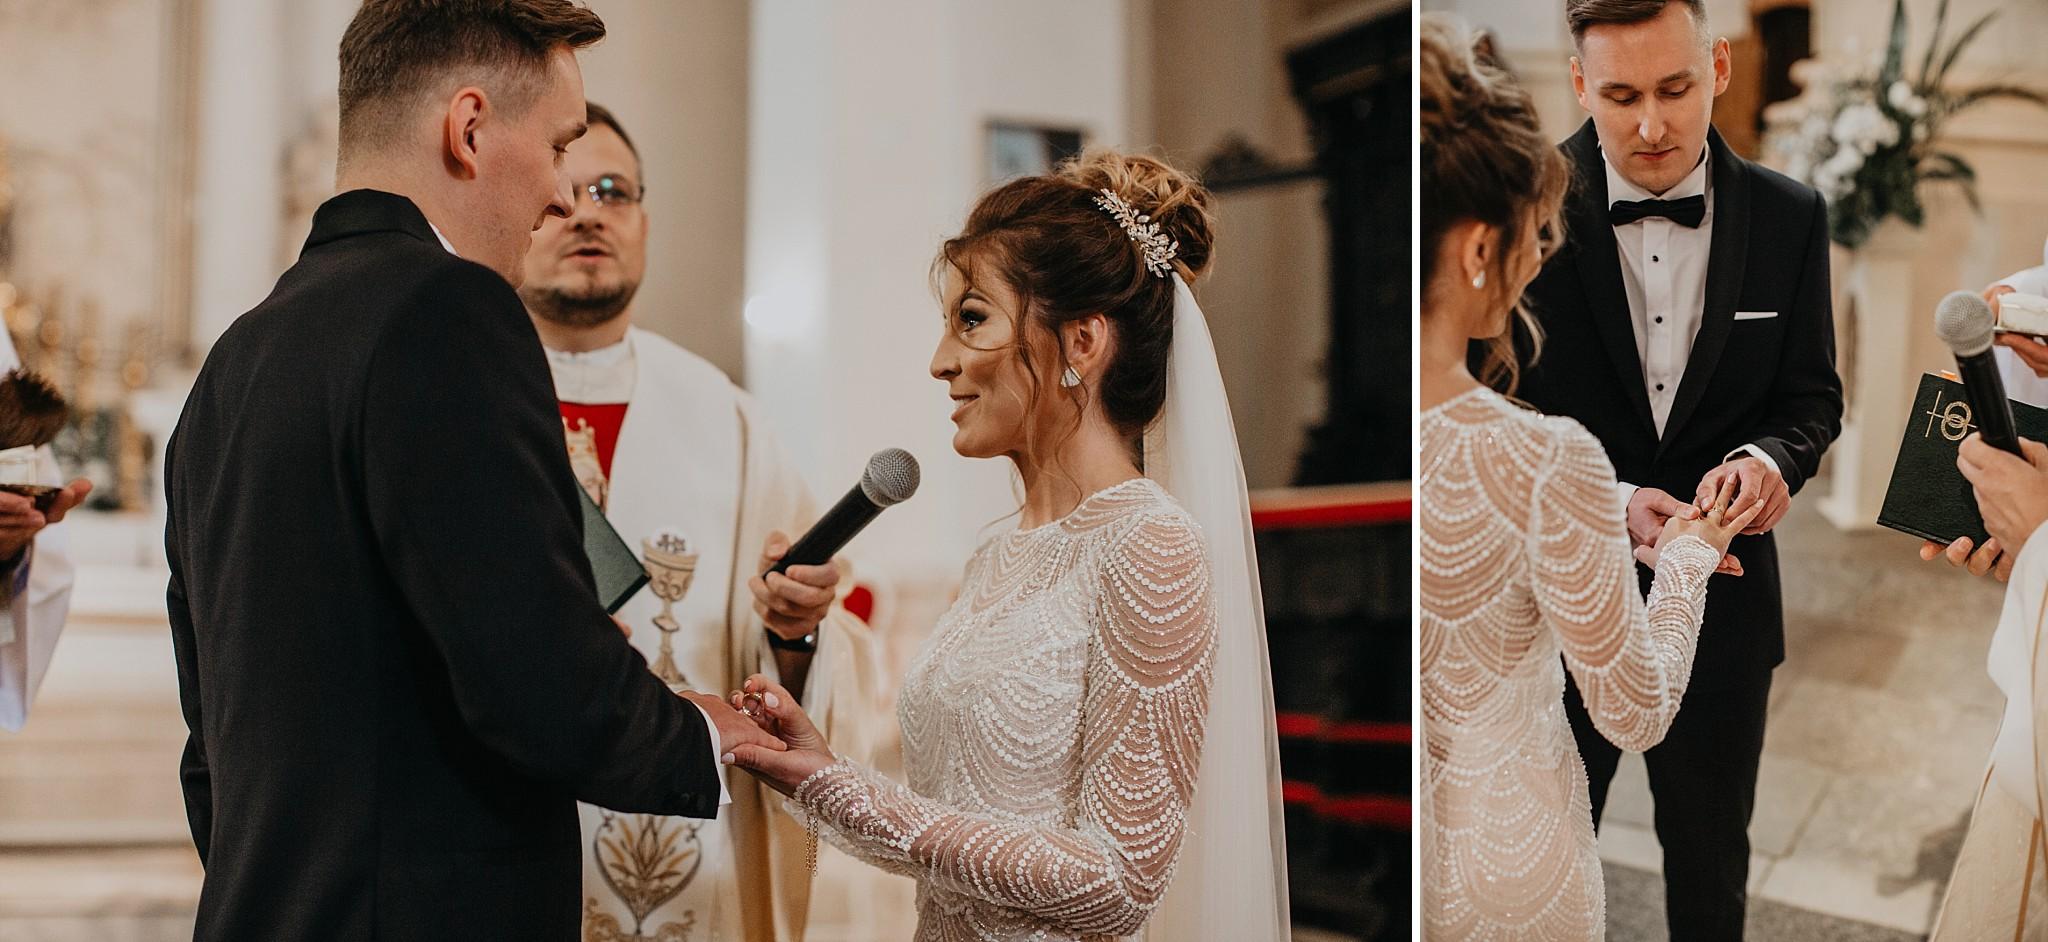 fotograf poznan wesele dobra truskawka piekne wesele pod poznaniem wesele w dobrej truskawce piekna para mloda slub marzen slub koronawirus slub listopad wesele koronawirus 177